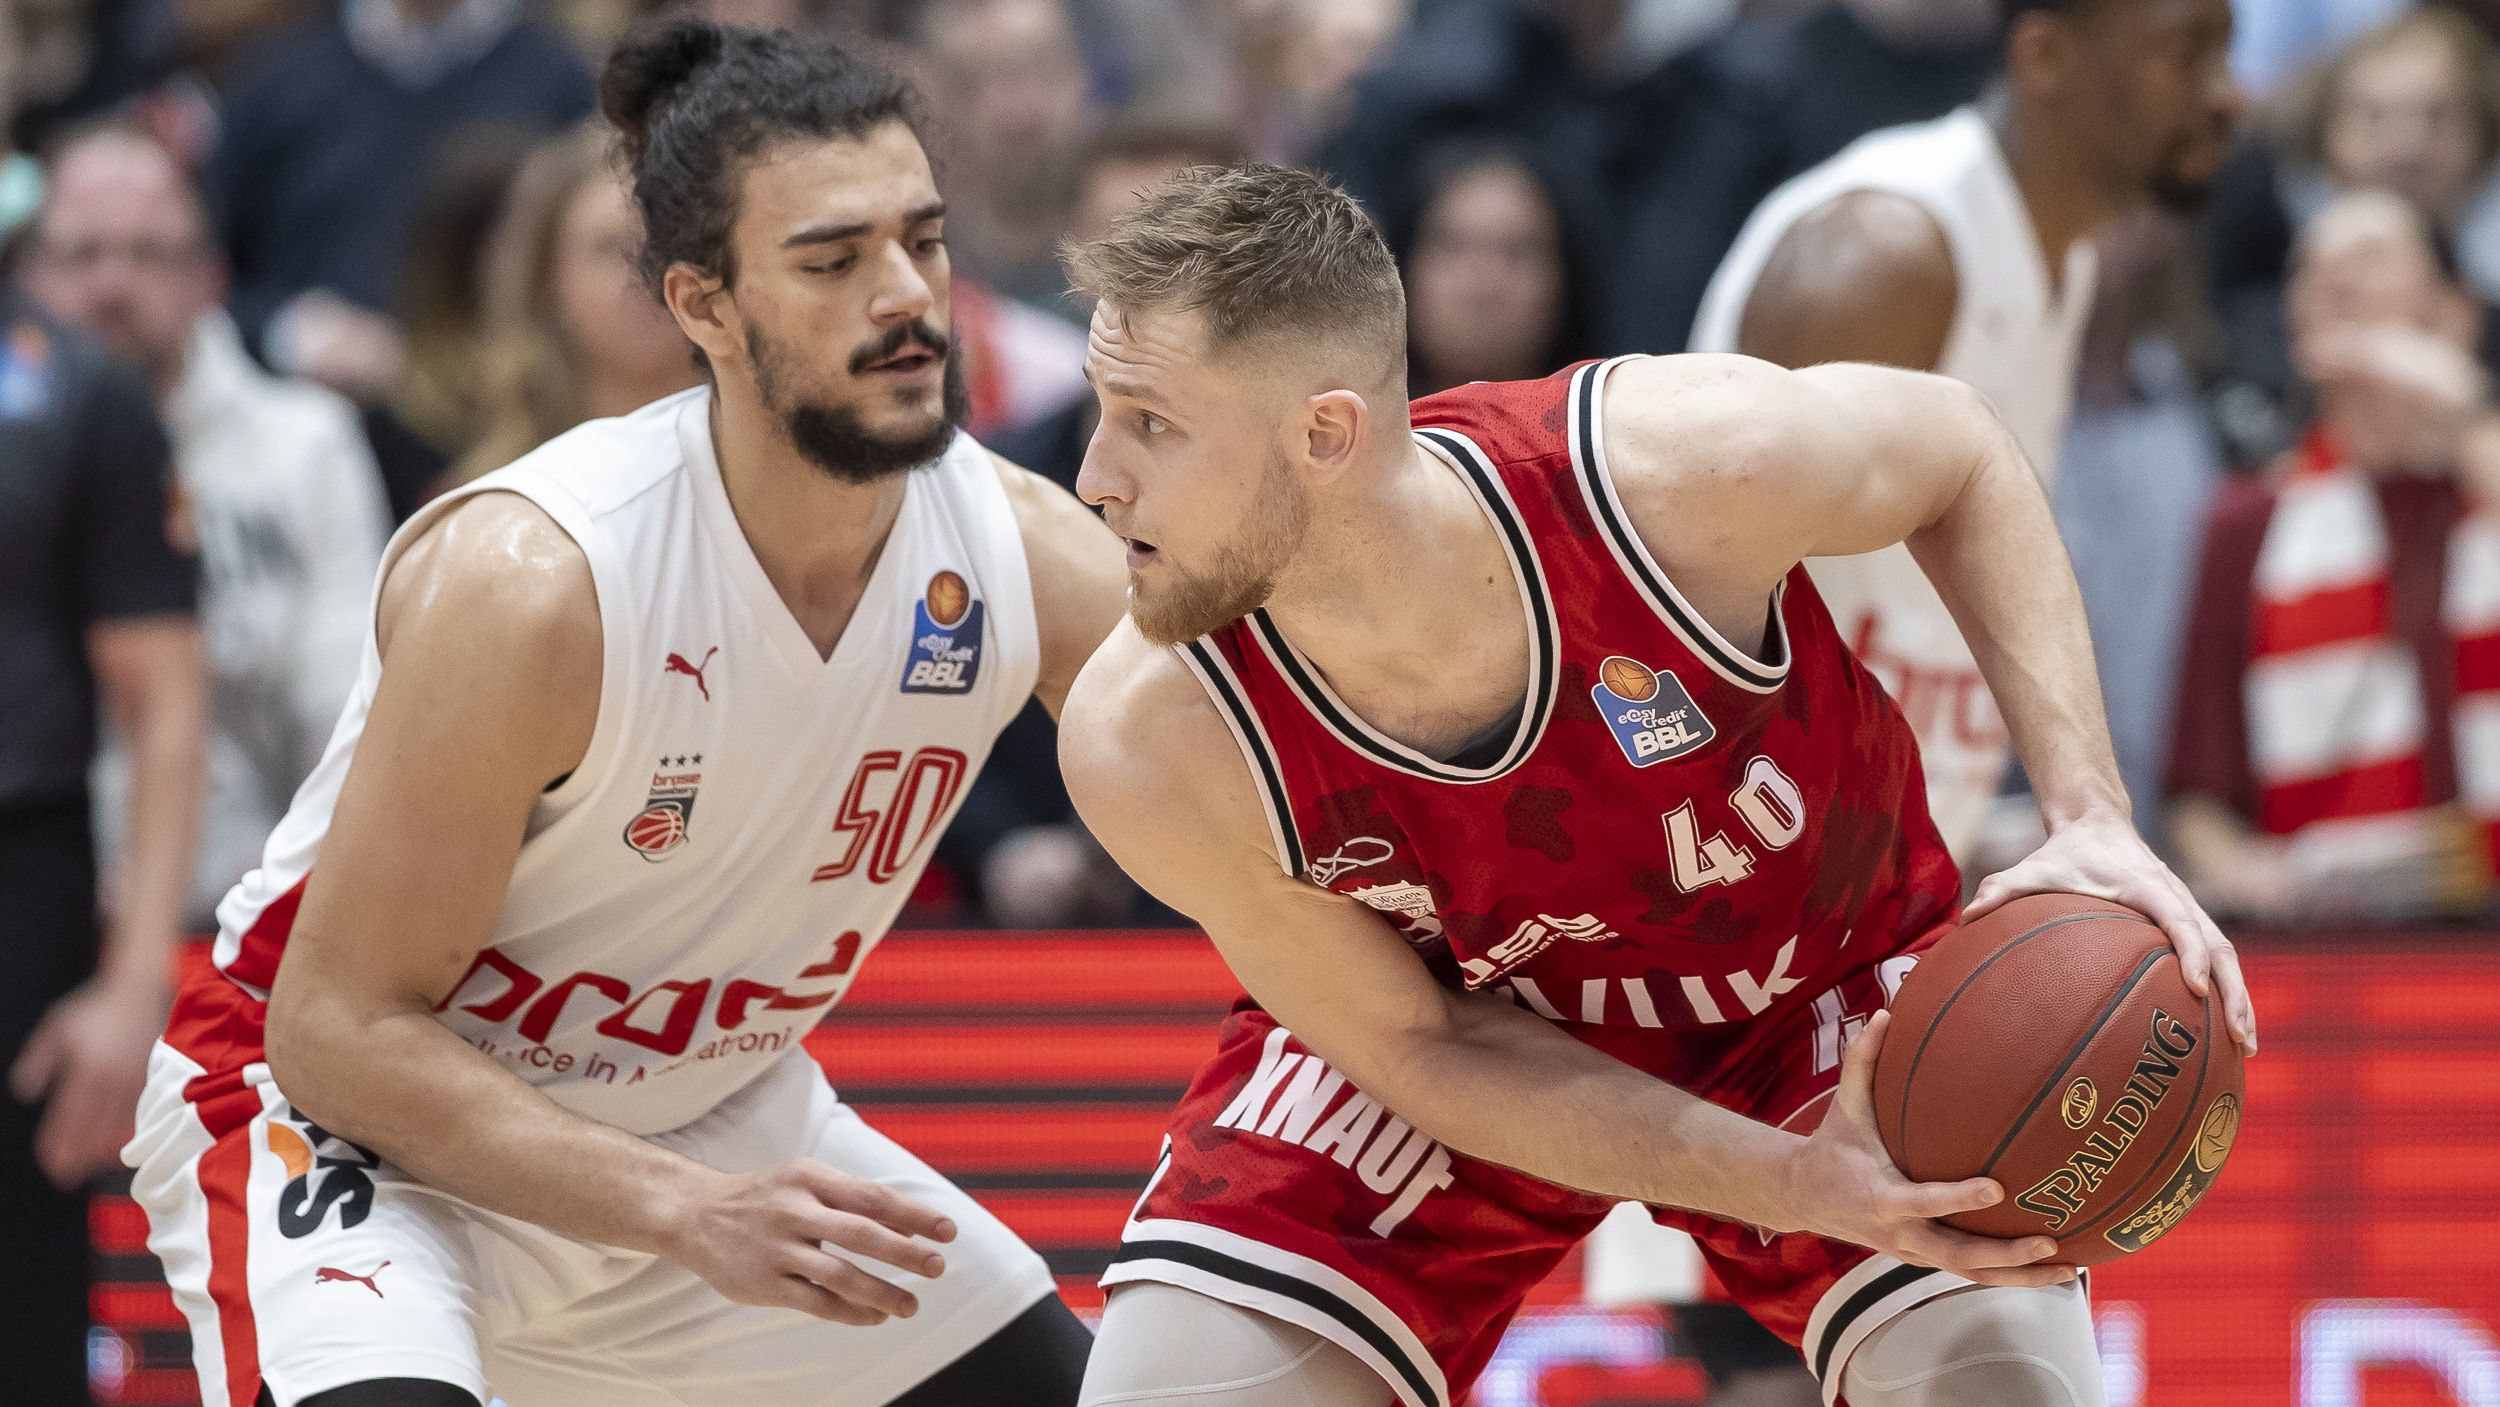 Kurzarbeit bei Würzburger Bundesliga-Basketballern